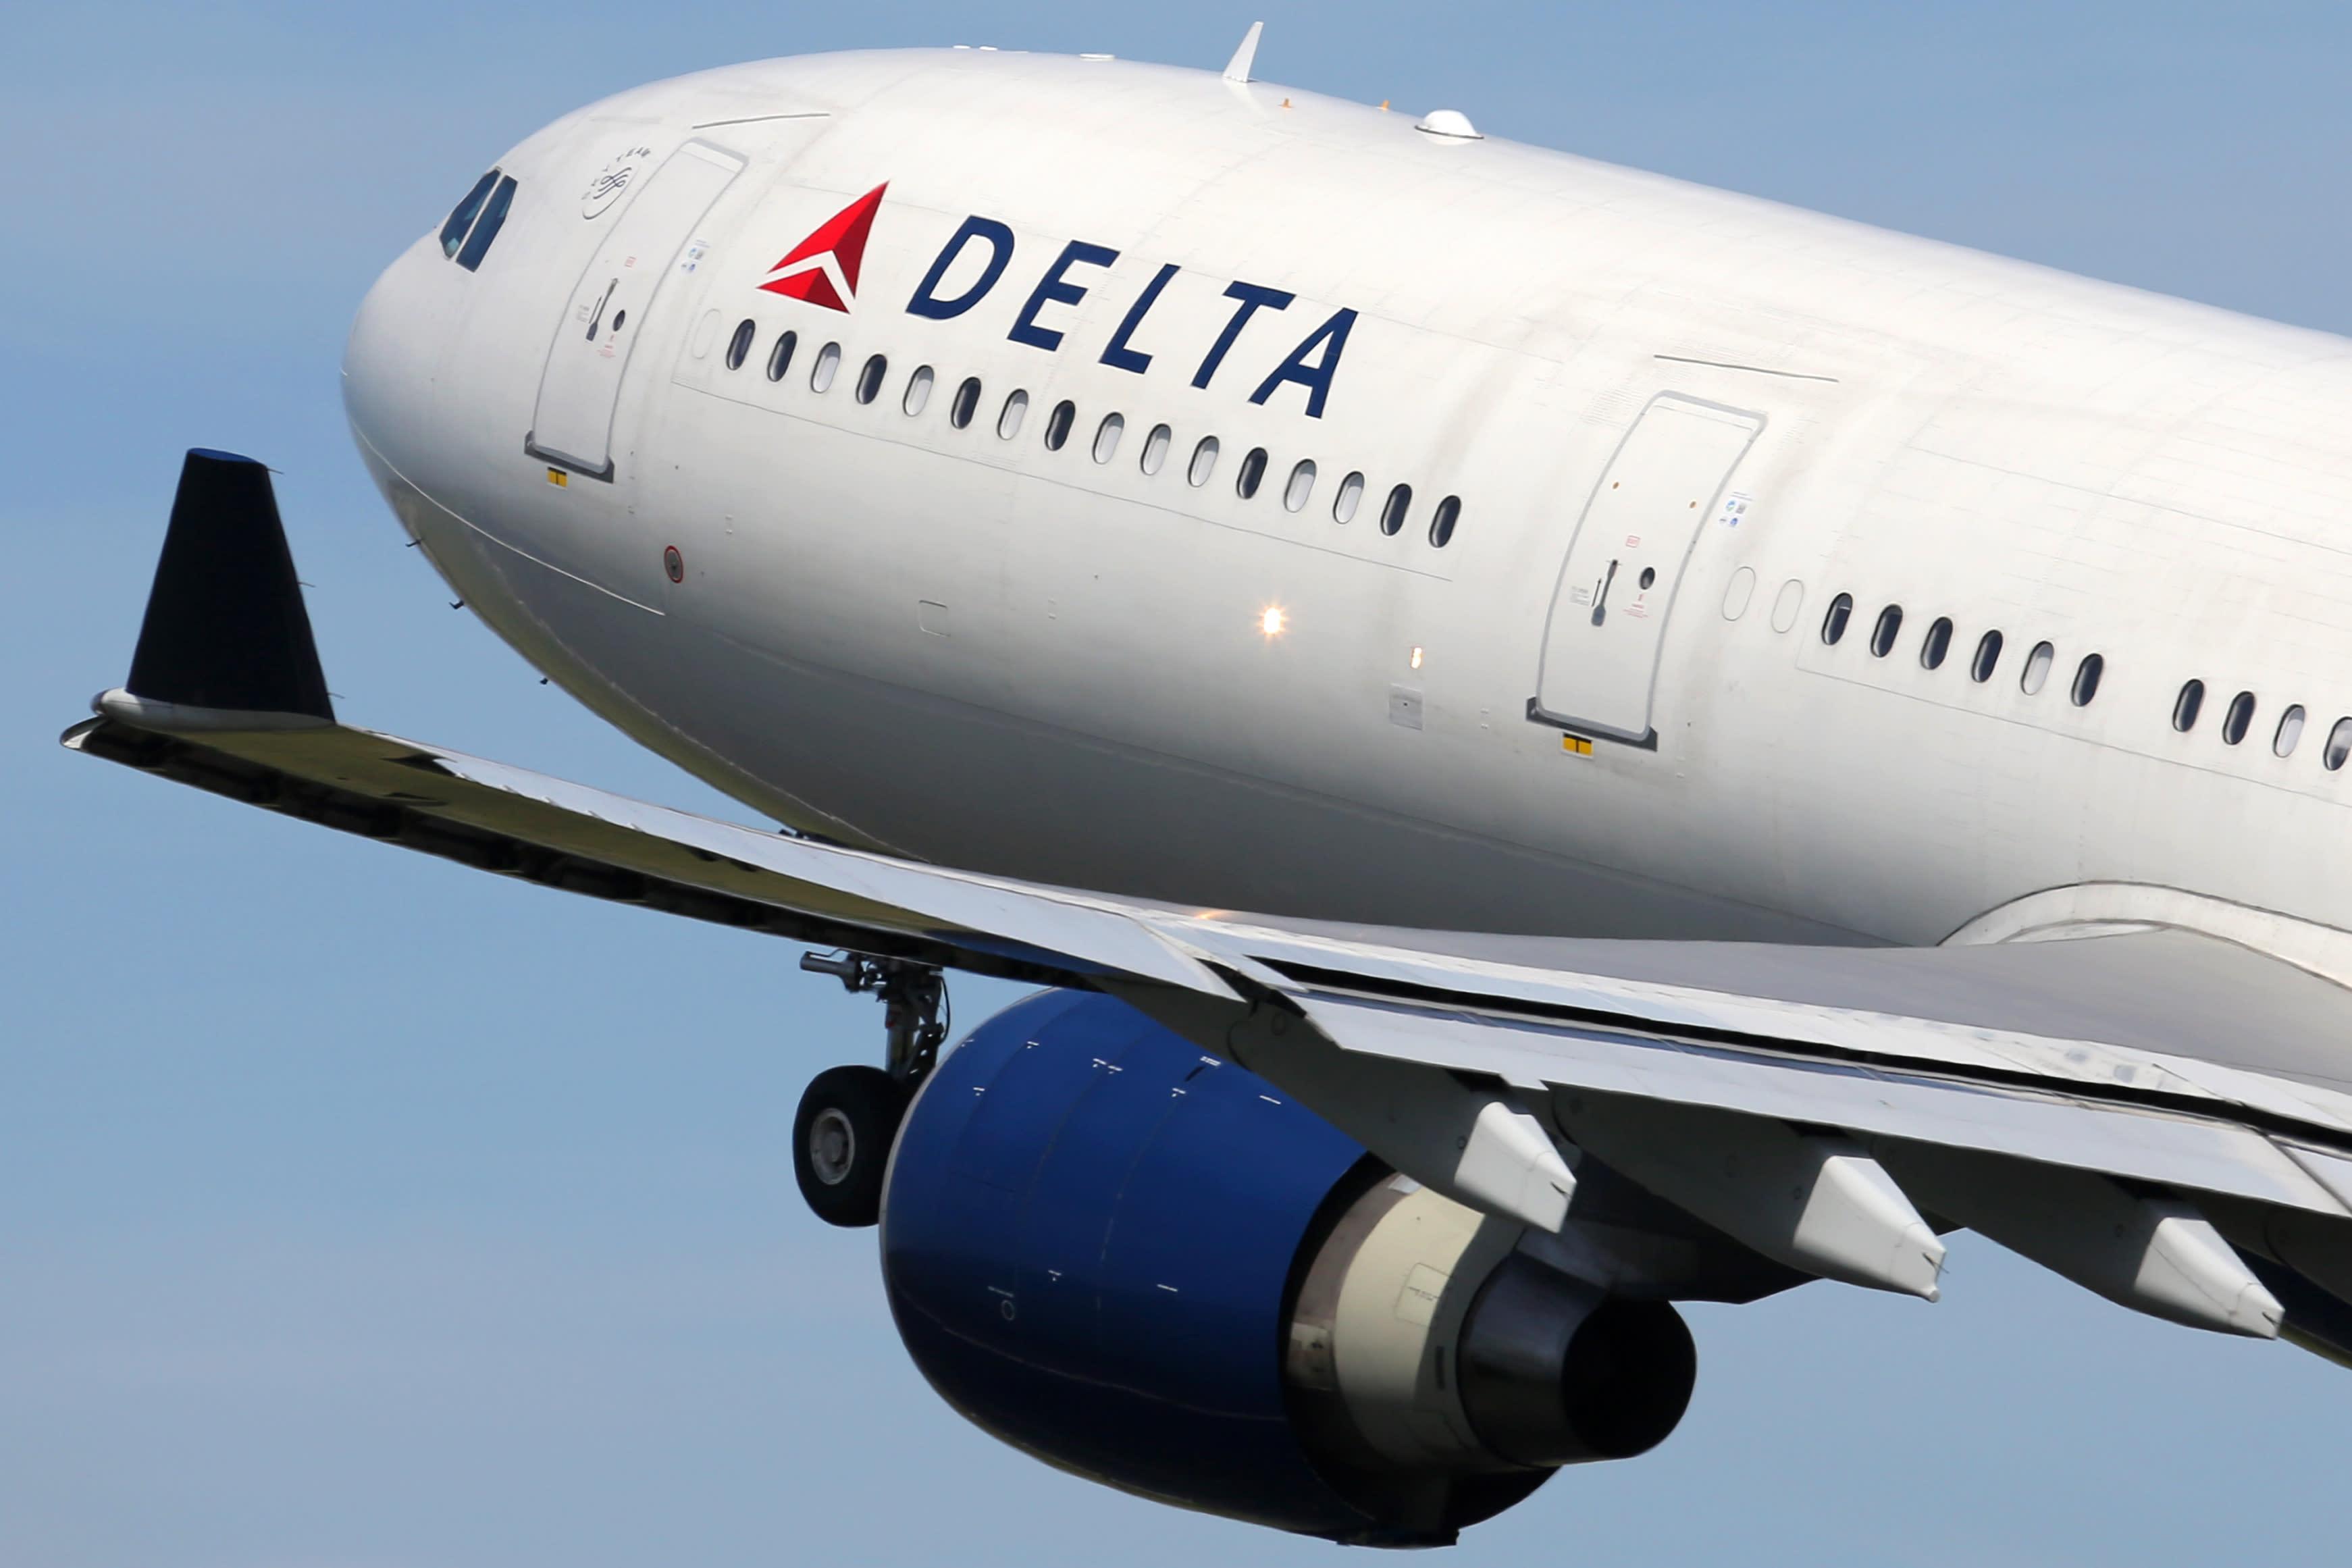 Delta posts narrower than expected Q1 loss as coronavirus hammered demand